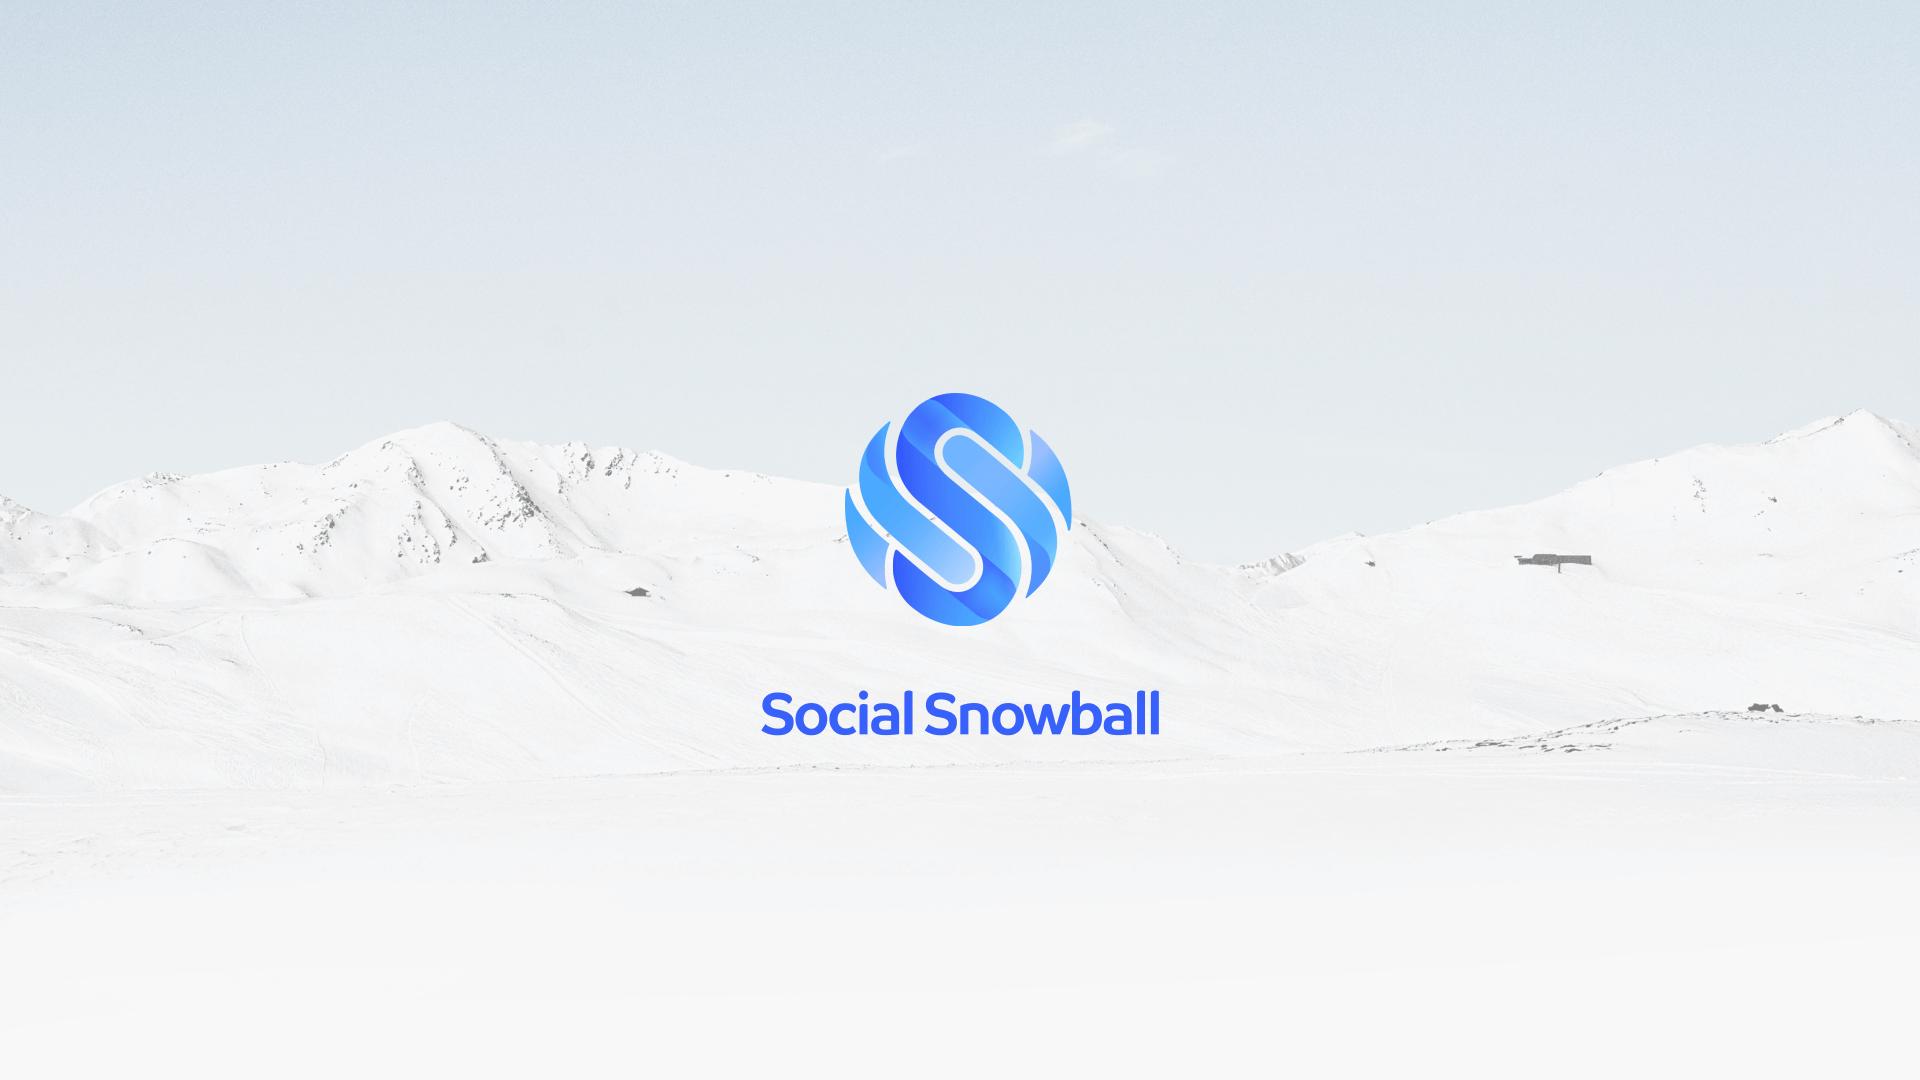 Tool Review: Social Snowball